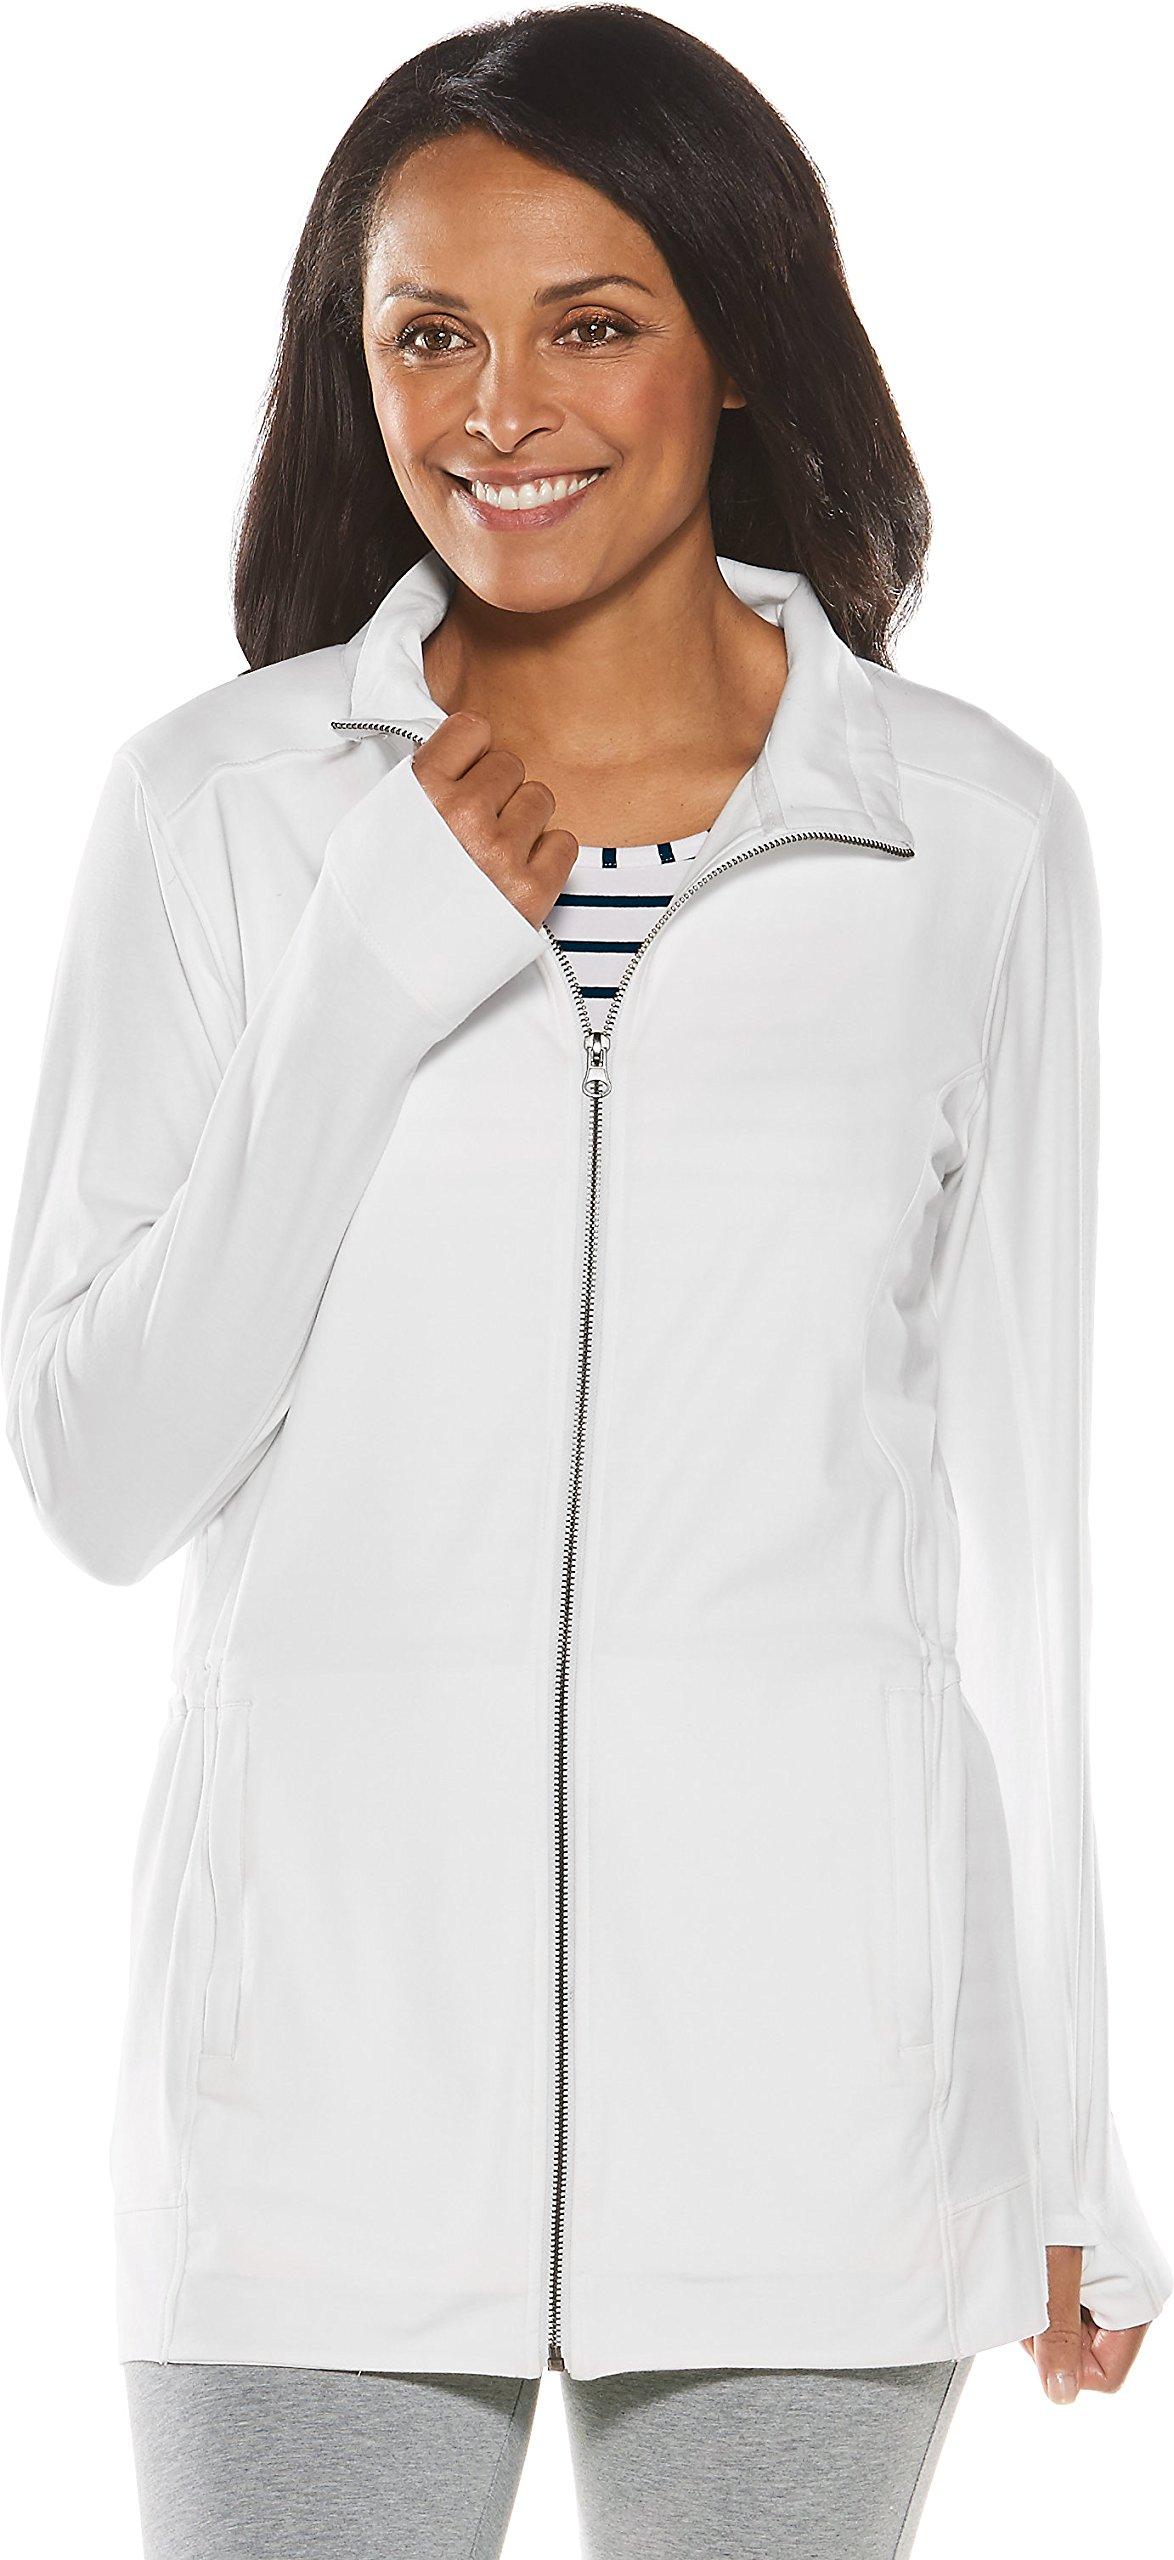 Coolibar UPF 50+ Women's Summer Jacket - Sun Protective (X-Large- White)